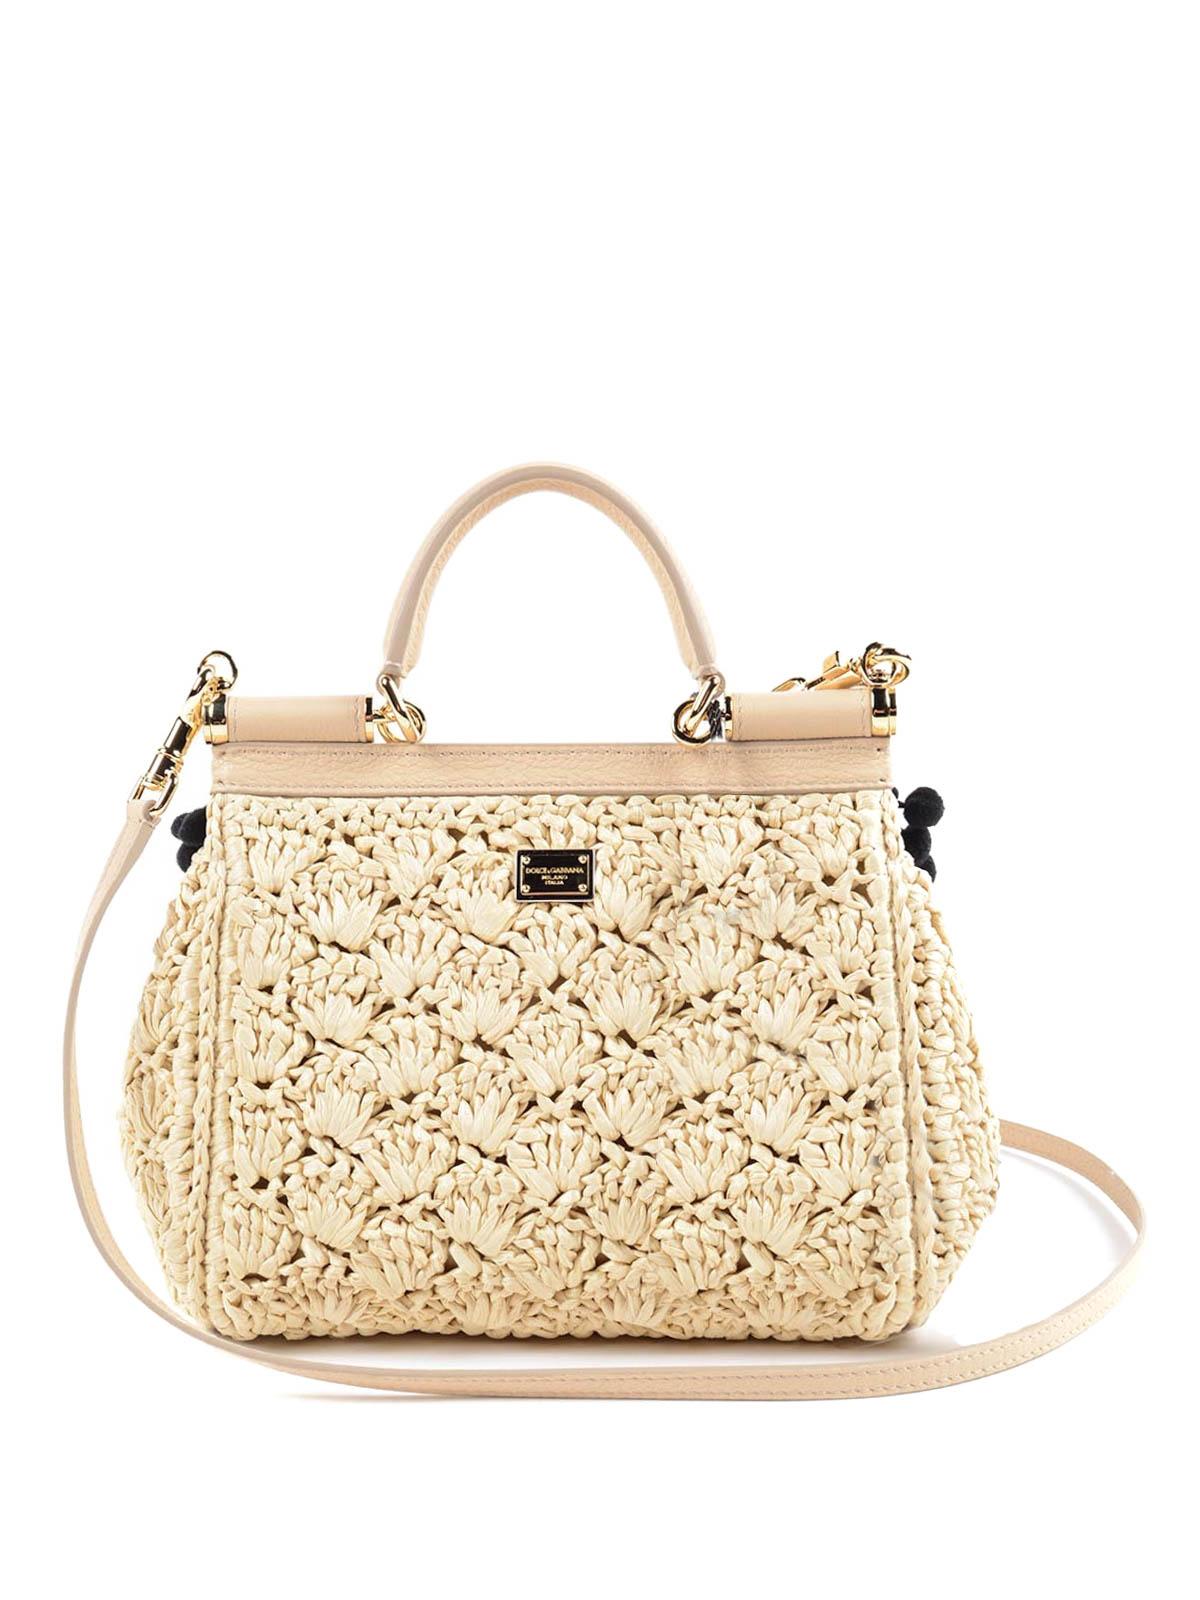 iKRIX DOLCE   GABBANA  cross body bags - Sicily embellished raffia bag 74551d9a3f887